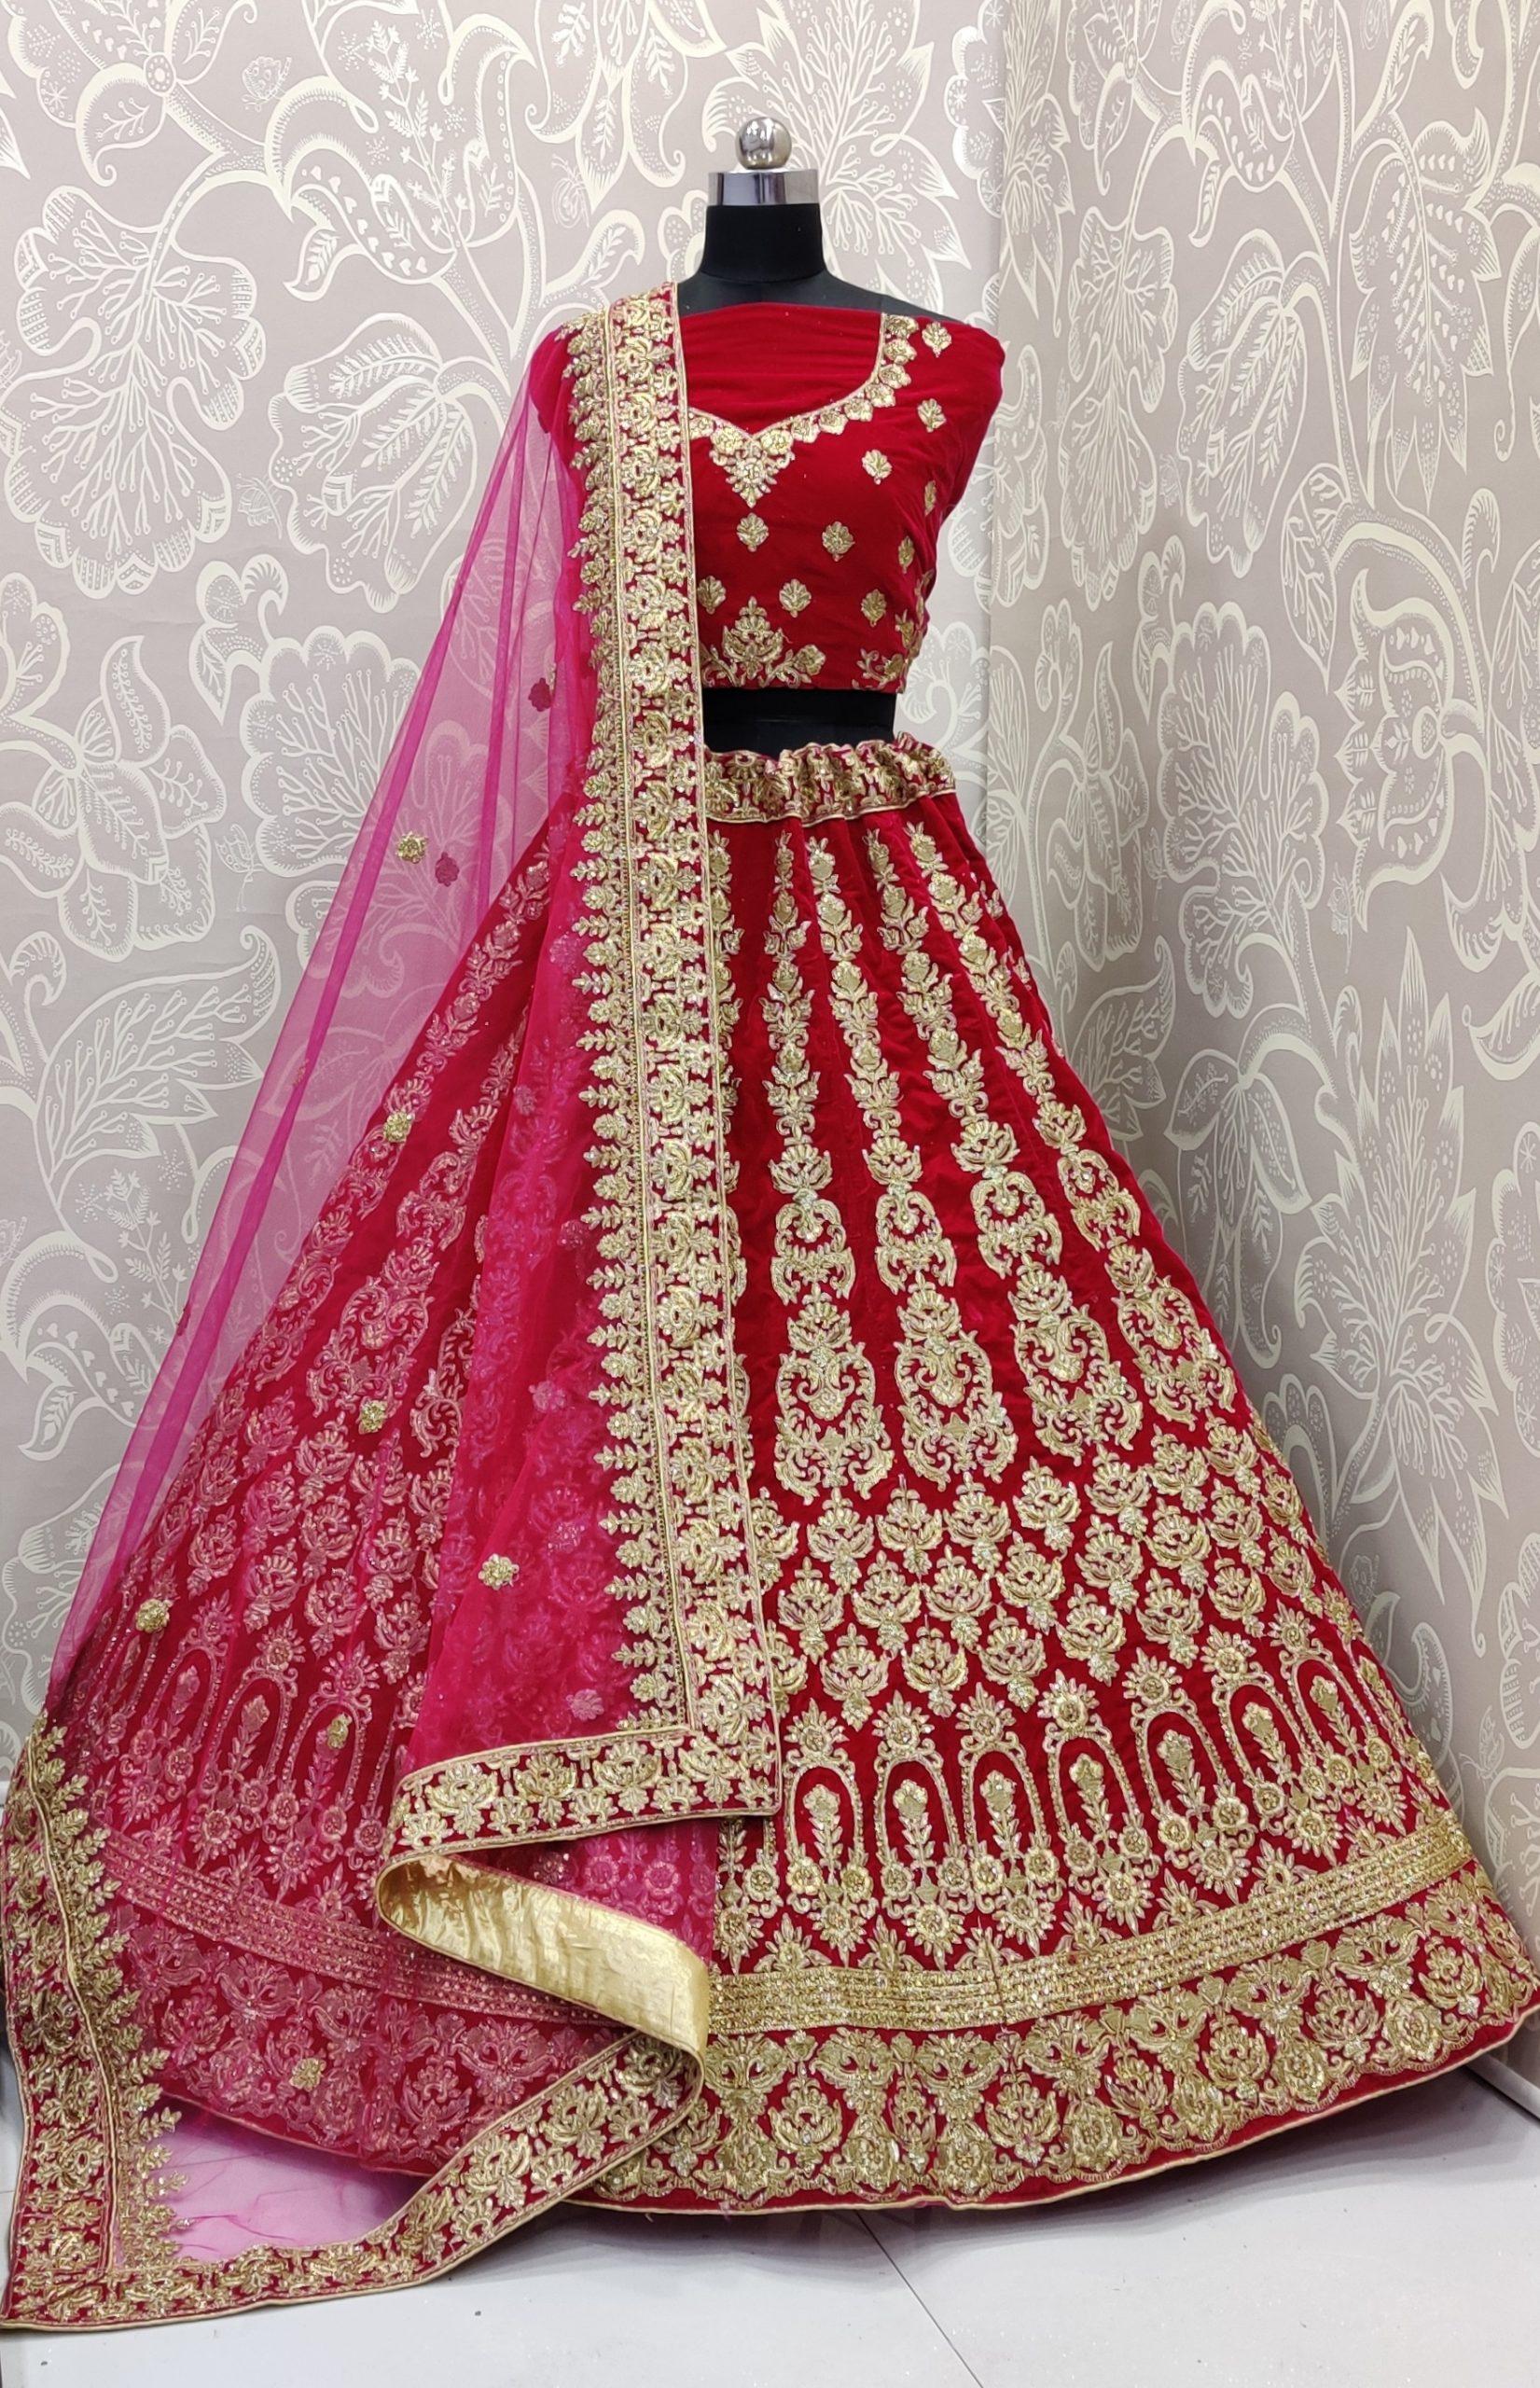 Velvet Fabric Lehenga In Rani Pink Color Iwm Pr4781 Soft net in 2.25 mtr length. velvet fabric lehenga in rani pink color iwm pr4781